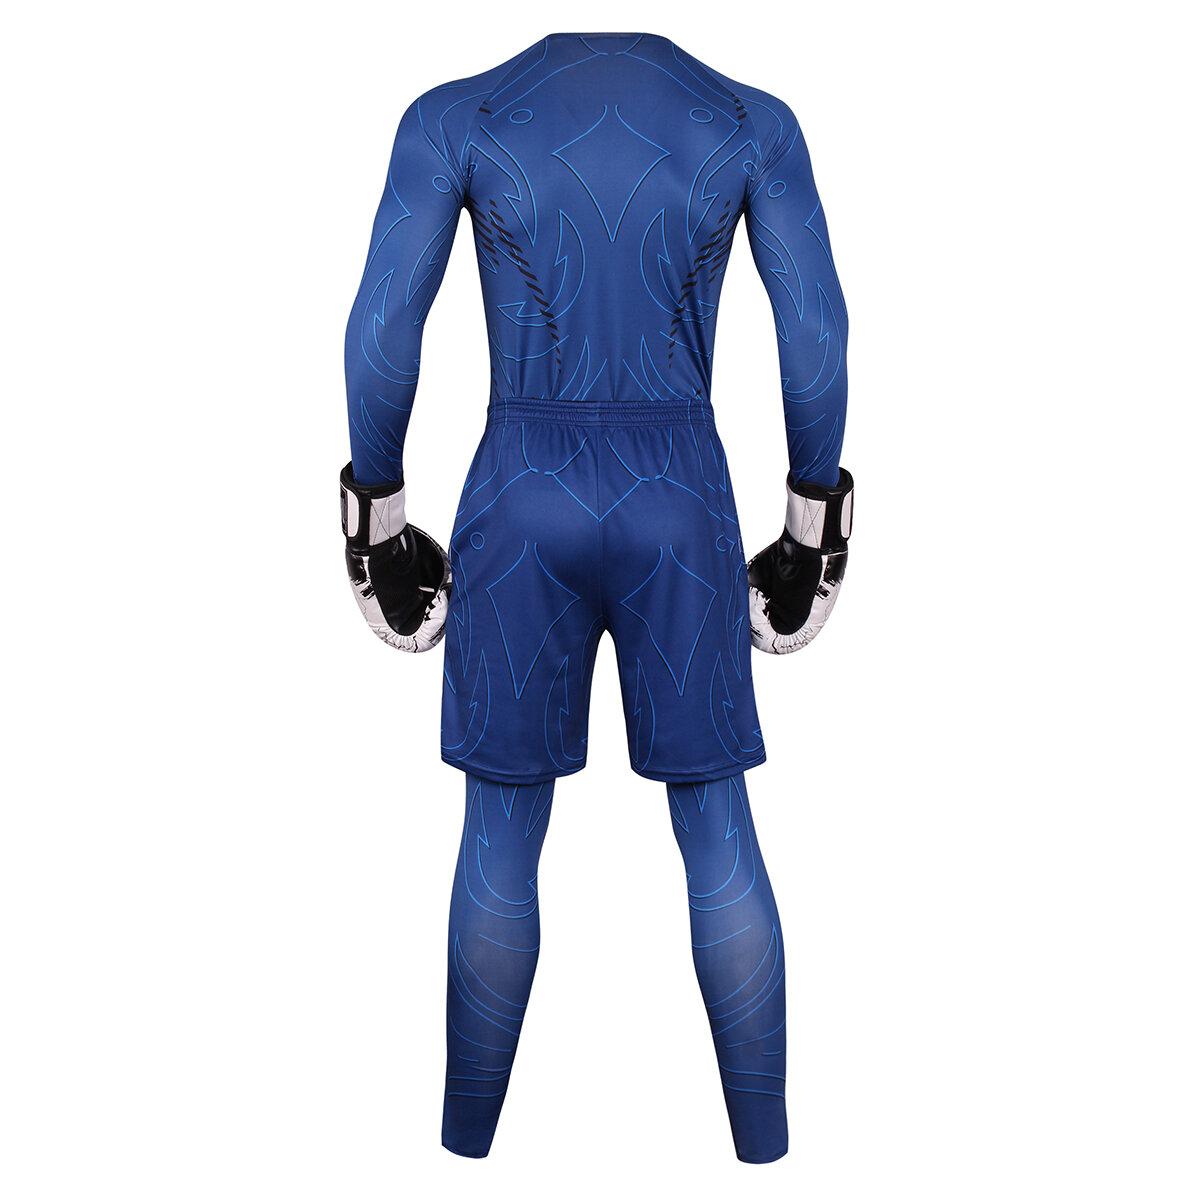 3 in 1 navy blue slimming suit for men